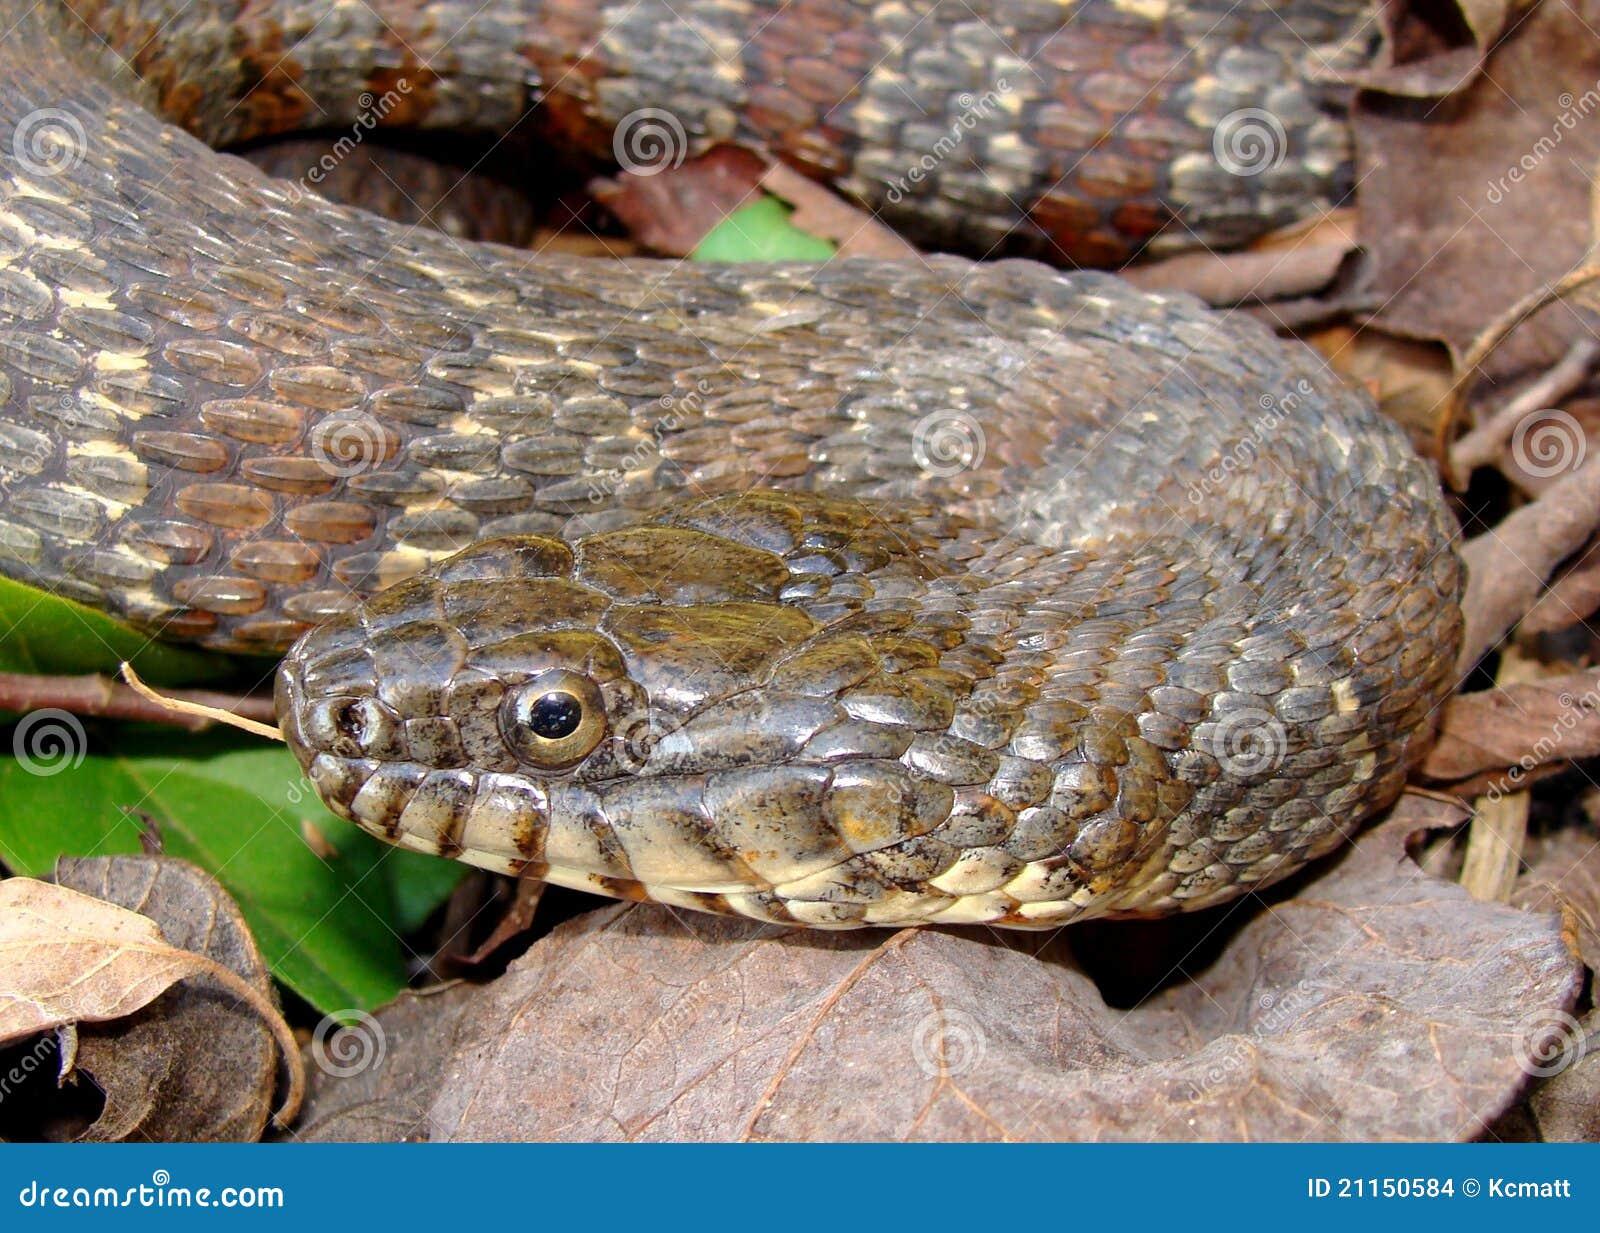 Northern Water Snake, Nerodia sipedon